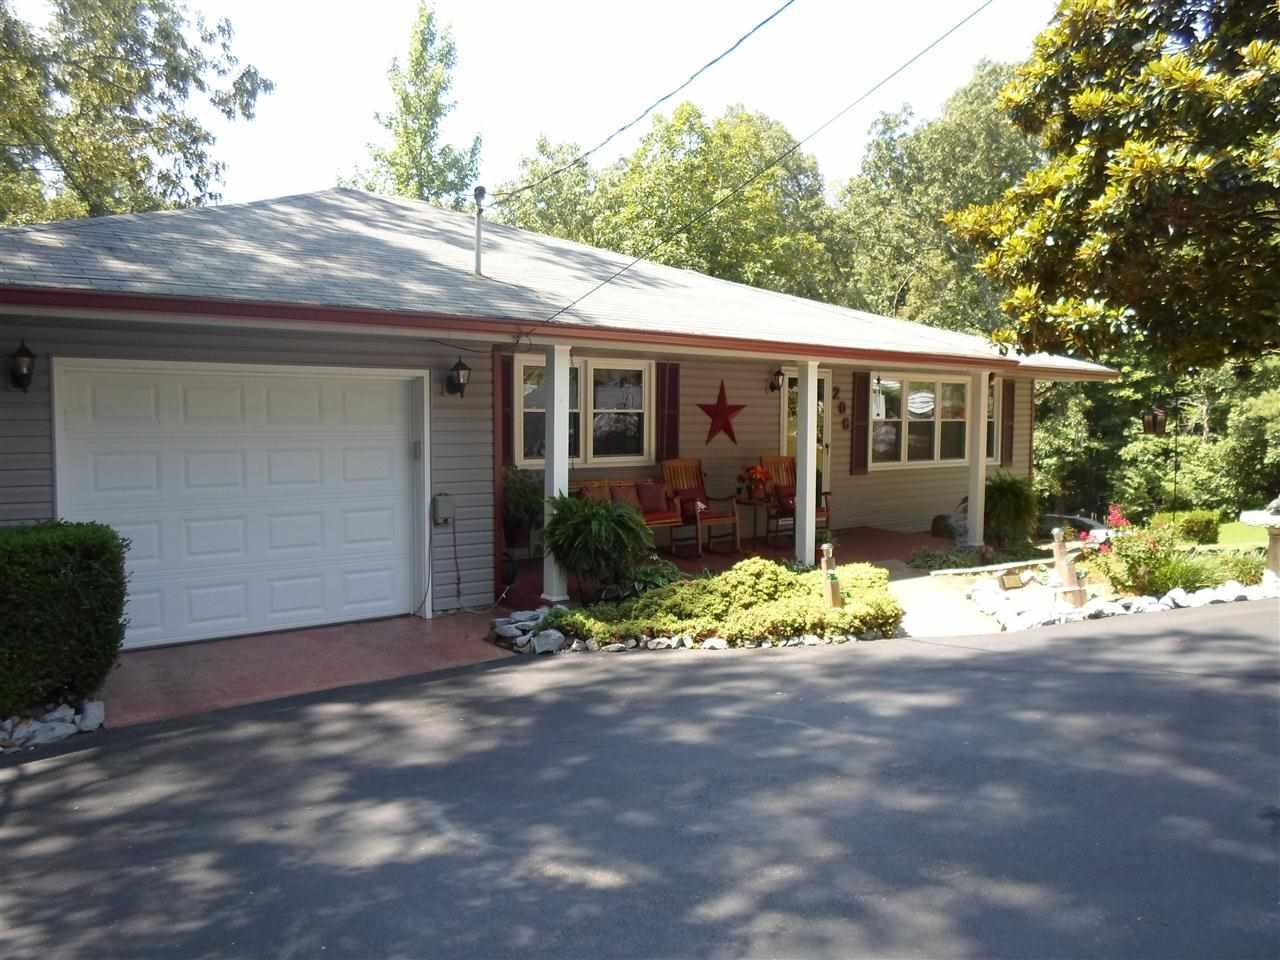 206 Leisure Acres Ln, Murray, KY 42071